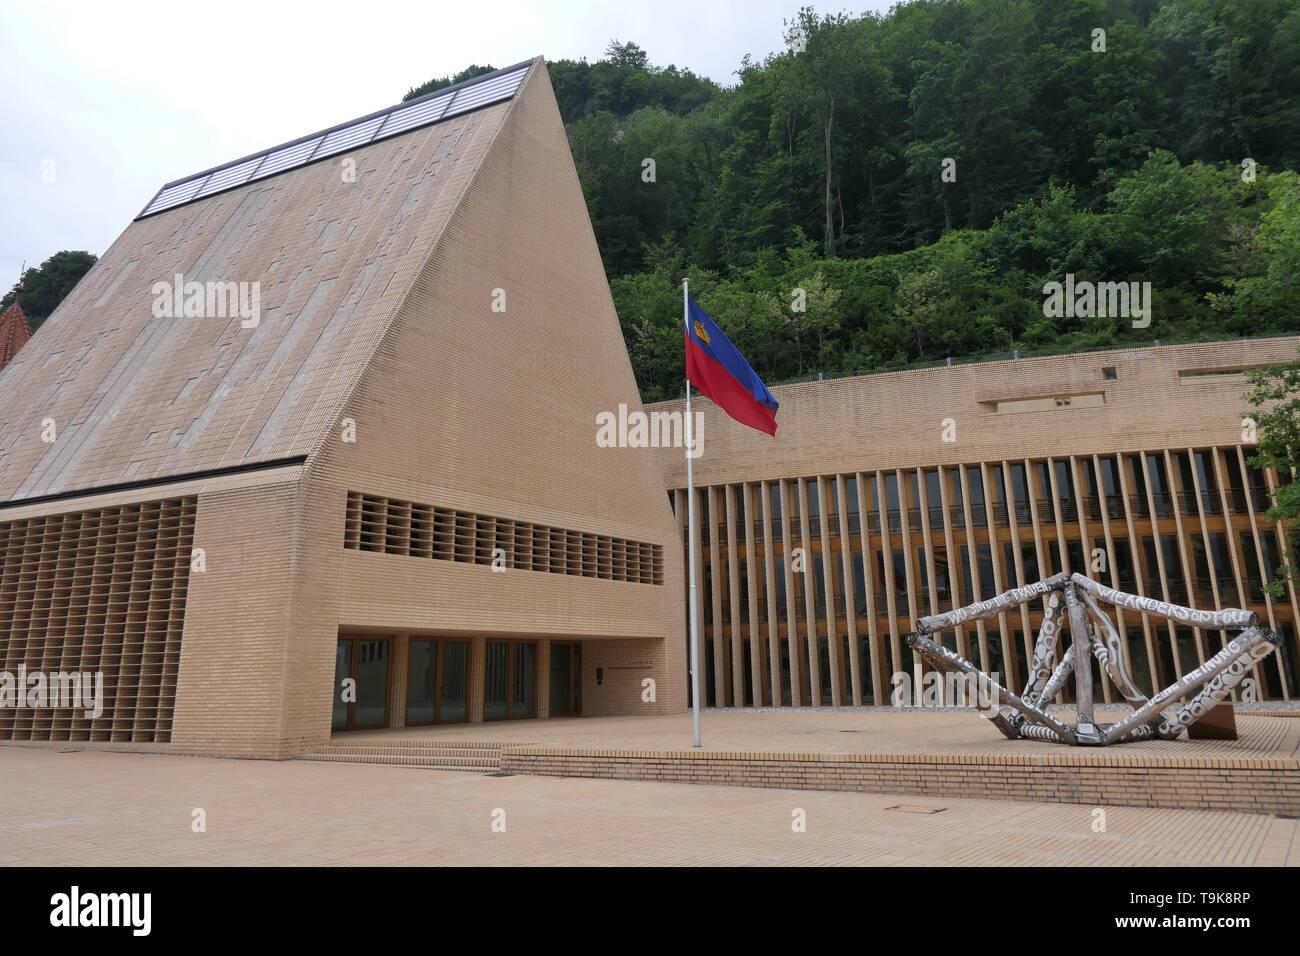 Vaduz Parliament Building, Government of Liechtenstein - Stock Image